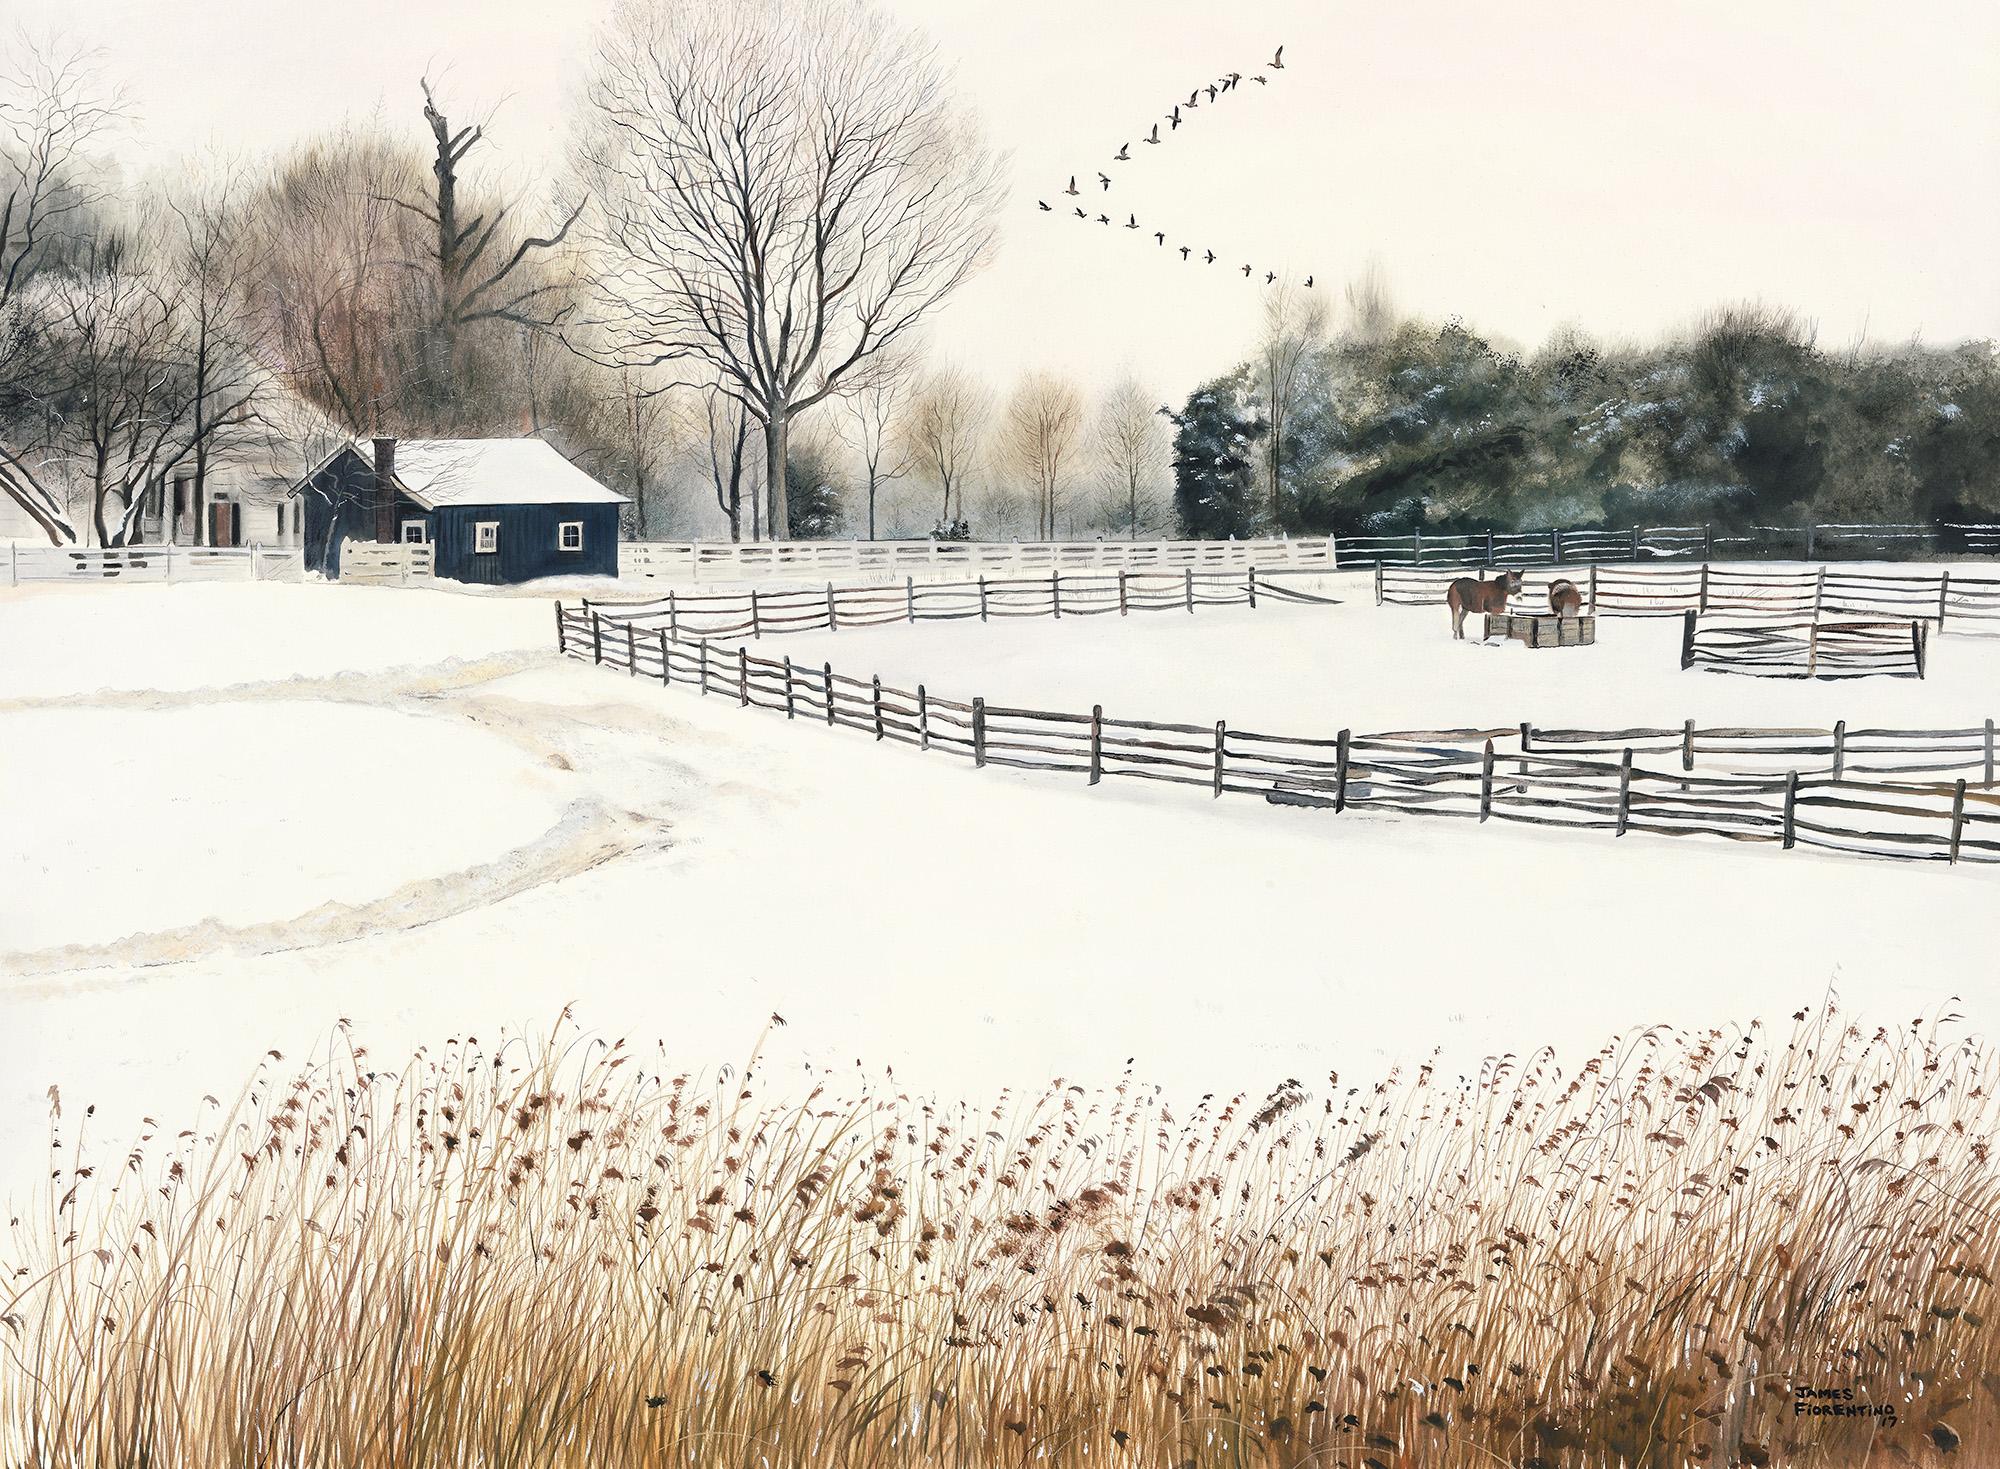 Fiorentino, James, Long Winter, watercolor, 22 x 30, 6000.jpeg